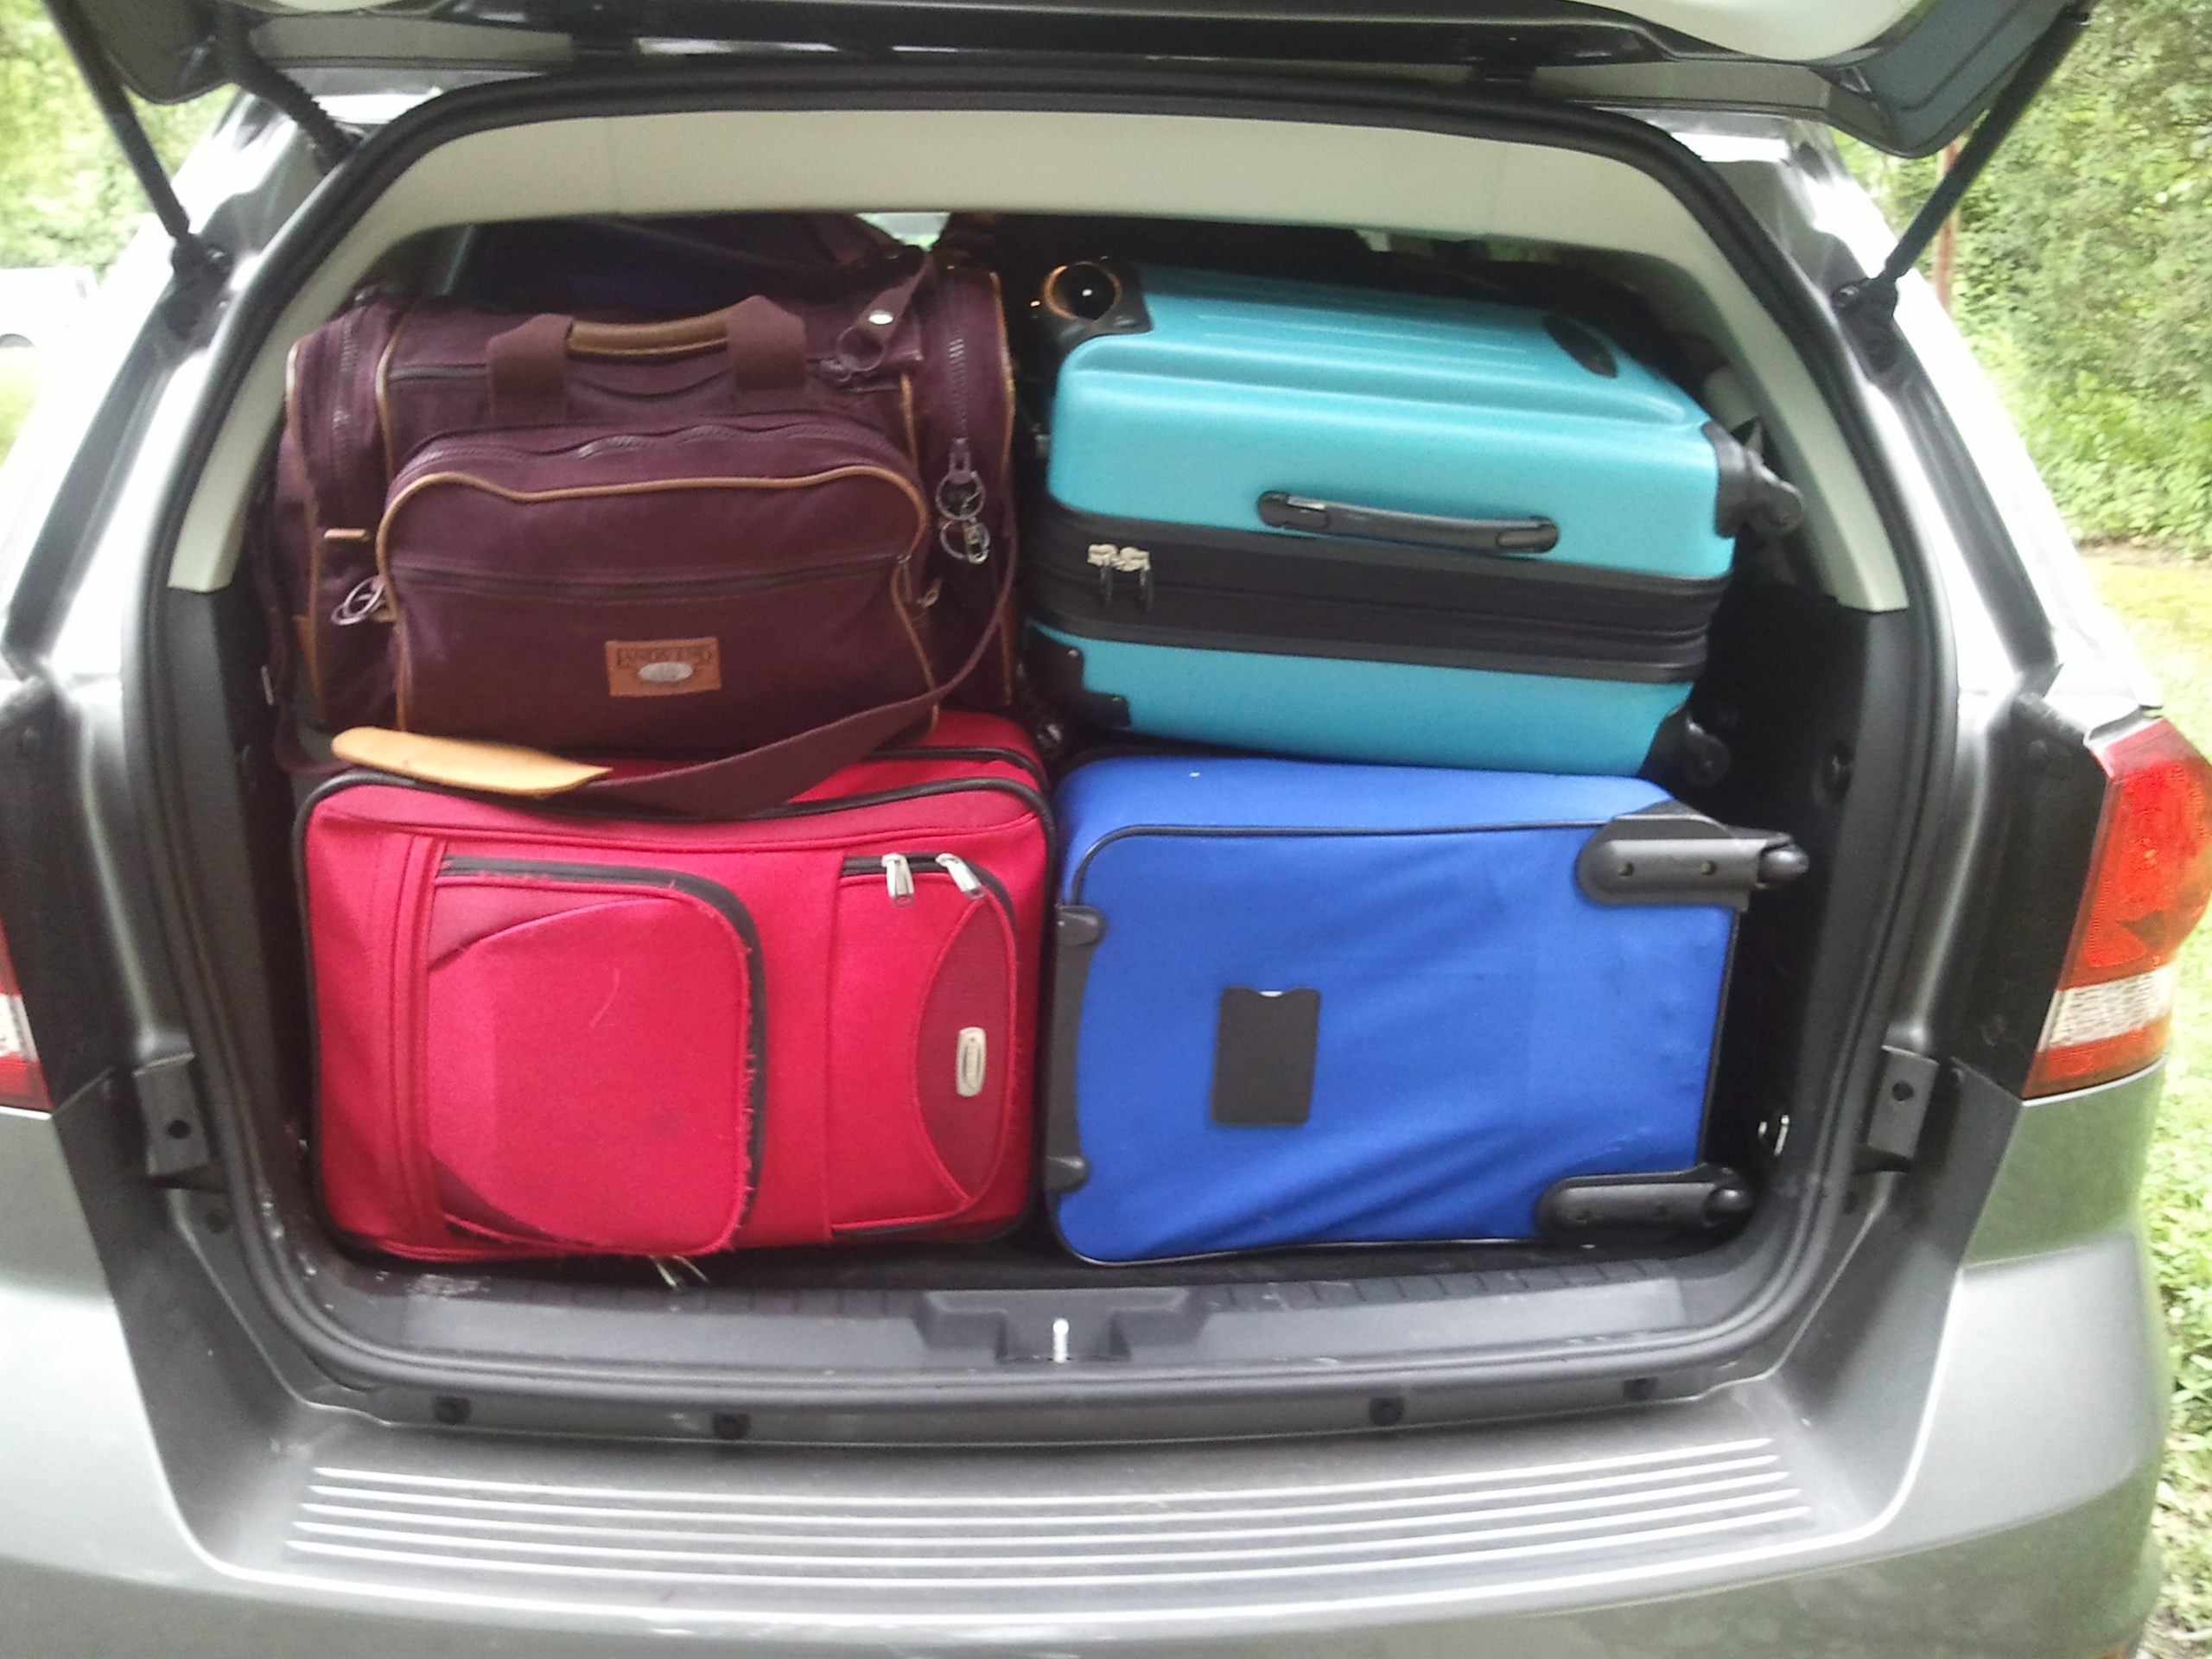 luggage filled car